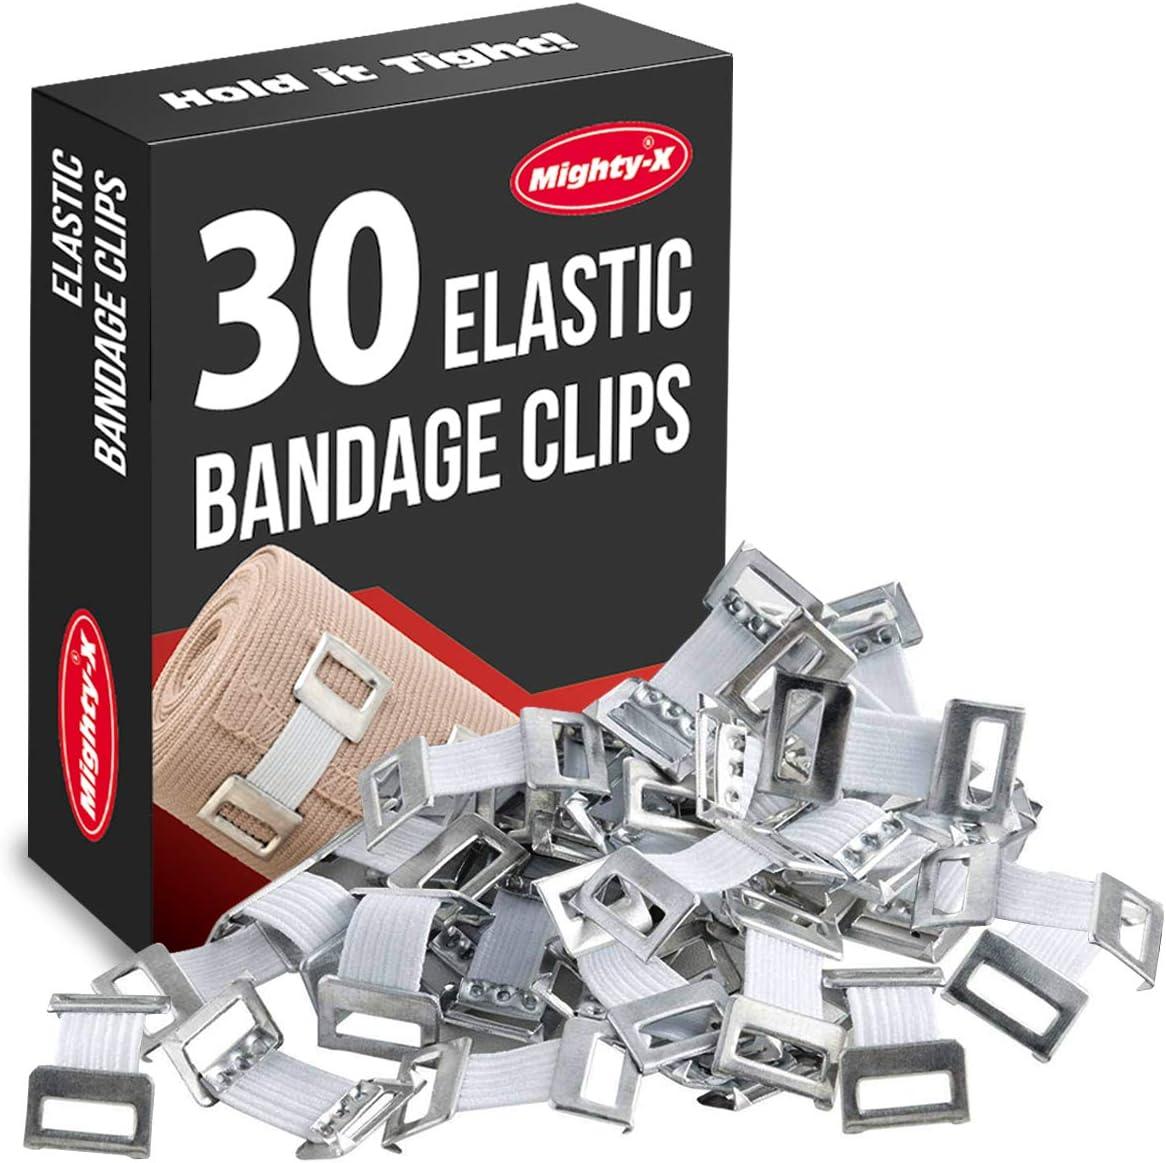 Elastic Bandage Clips - 30 Pack - Bandage Wrap Clips : Health & Household